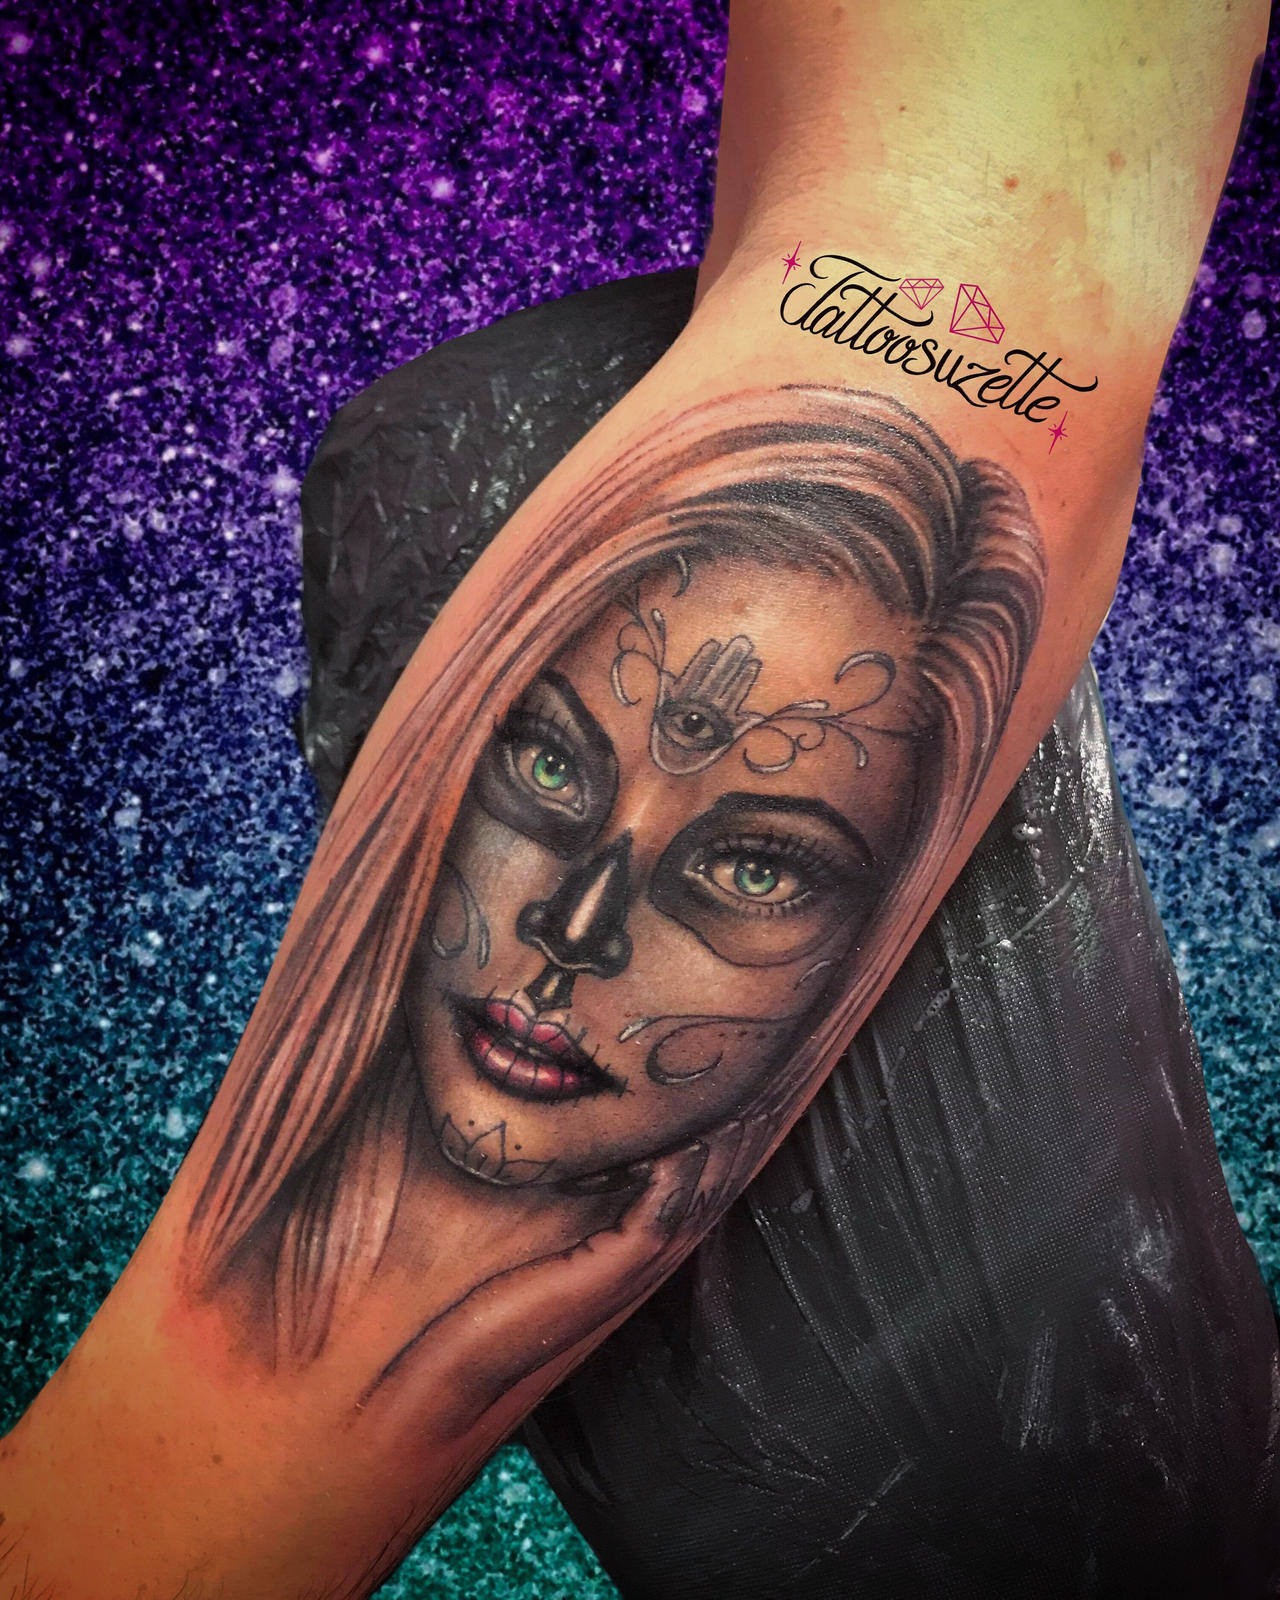 Santa muerte tattoo by tattoosuzette on DeviantArt